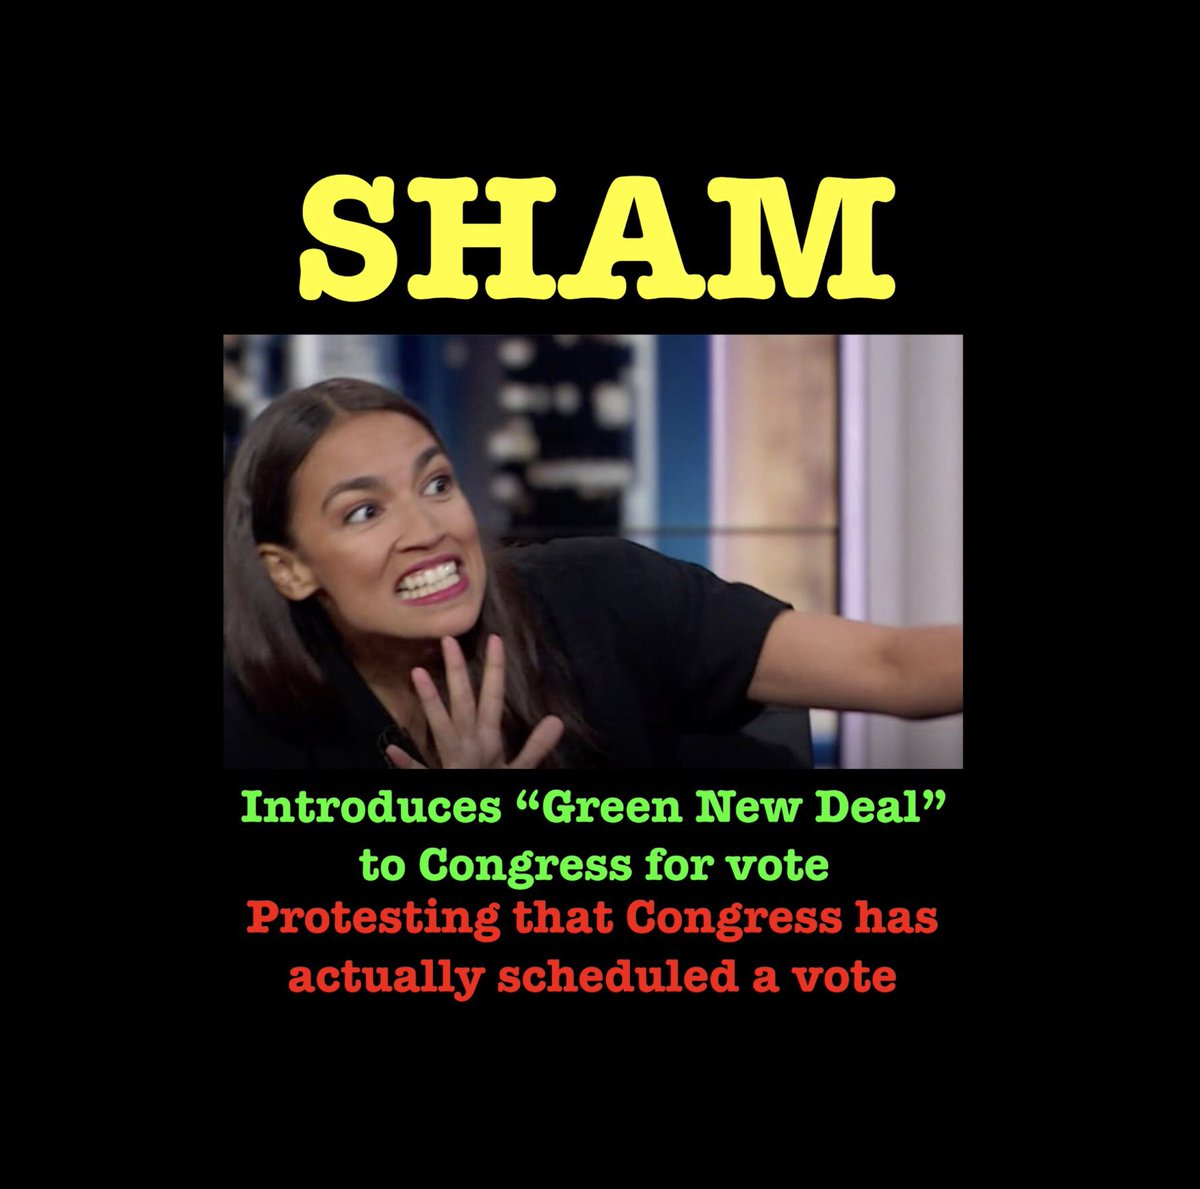 @AOC @realDonaldTrump @POTUS  @SpeakerPelosi @chuckschumer #GreenNewDeal